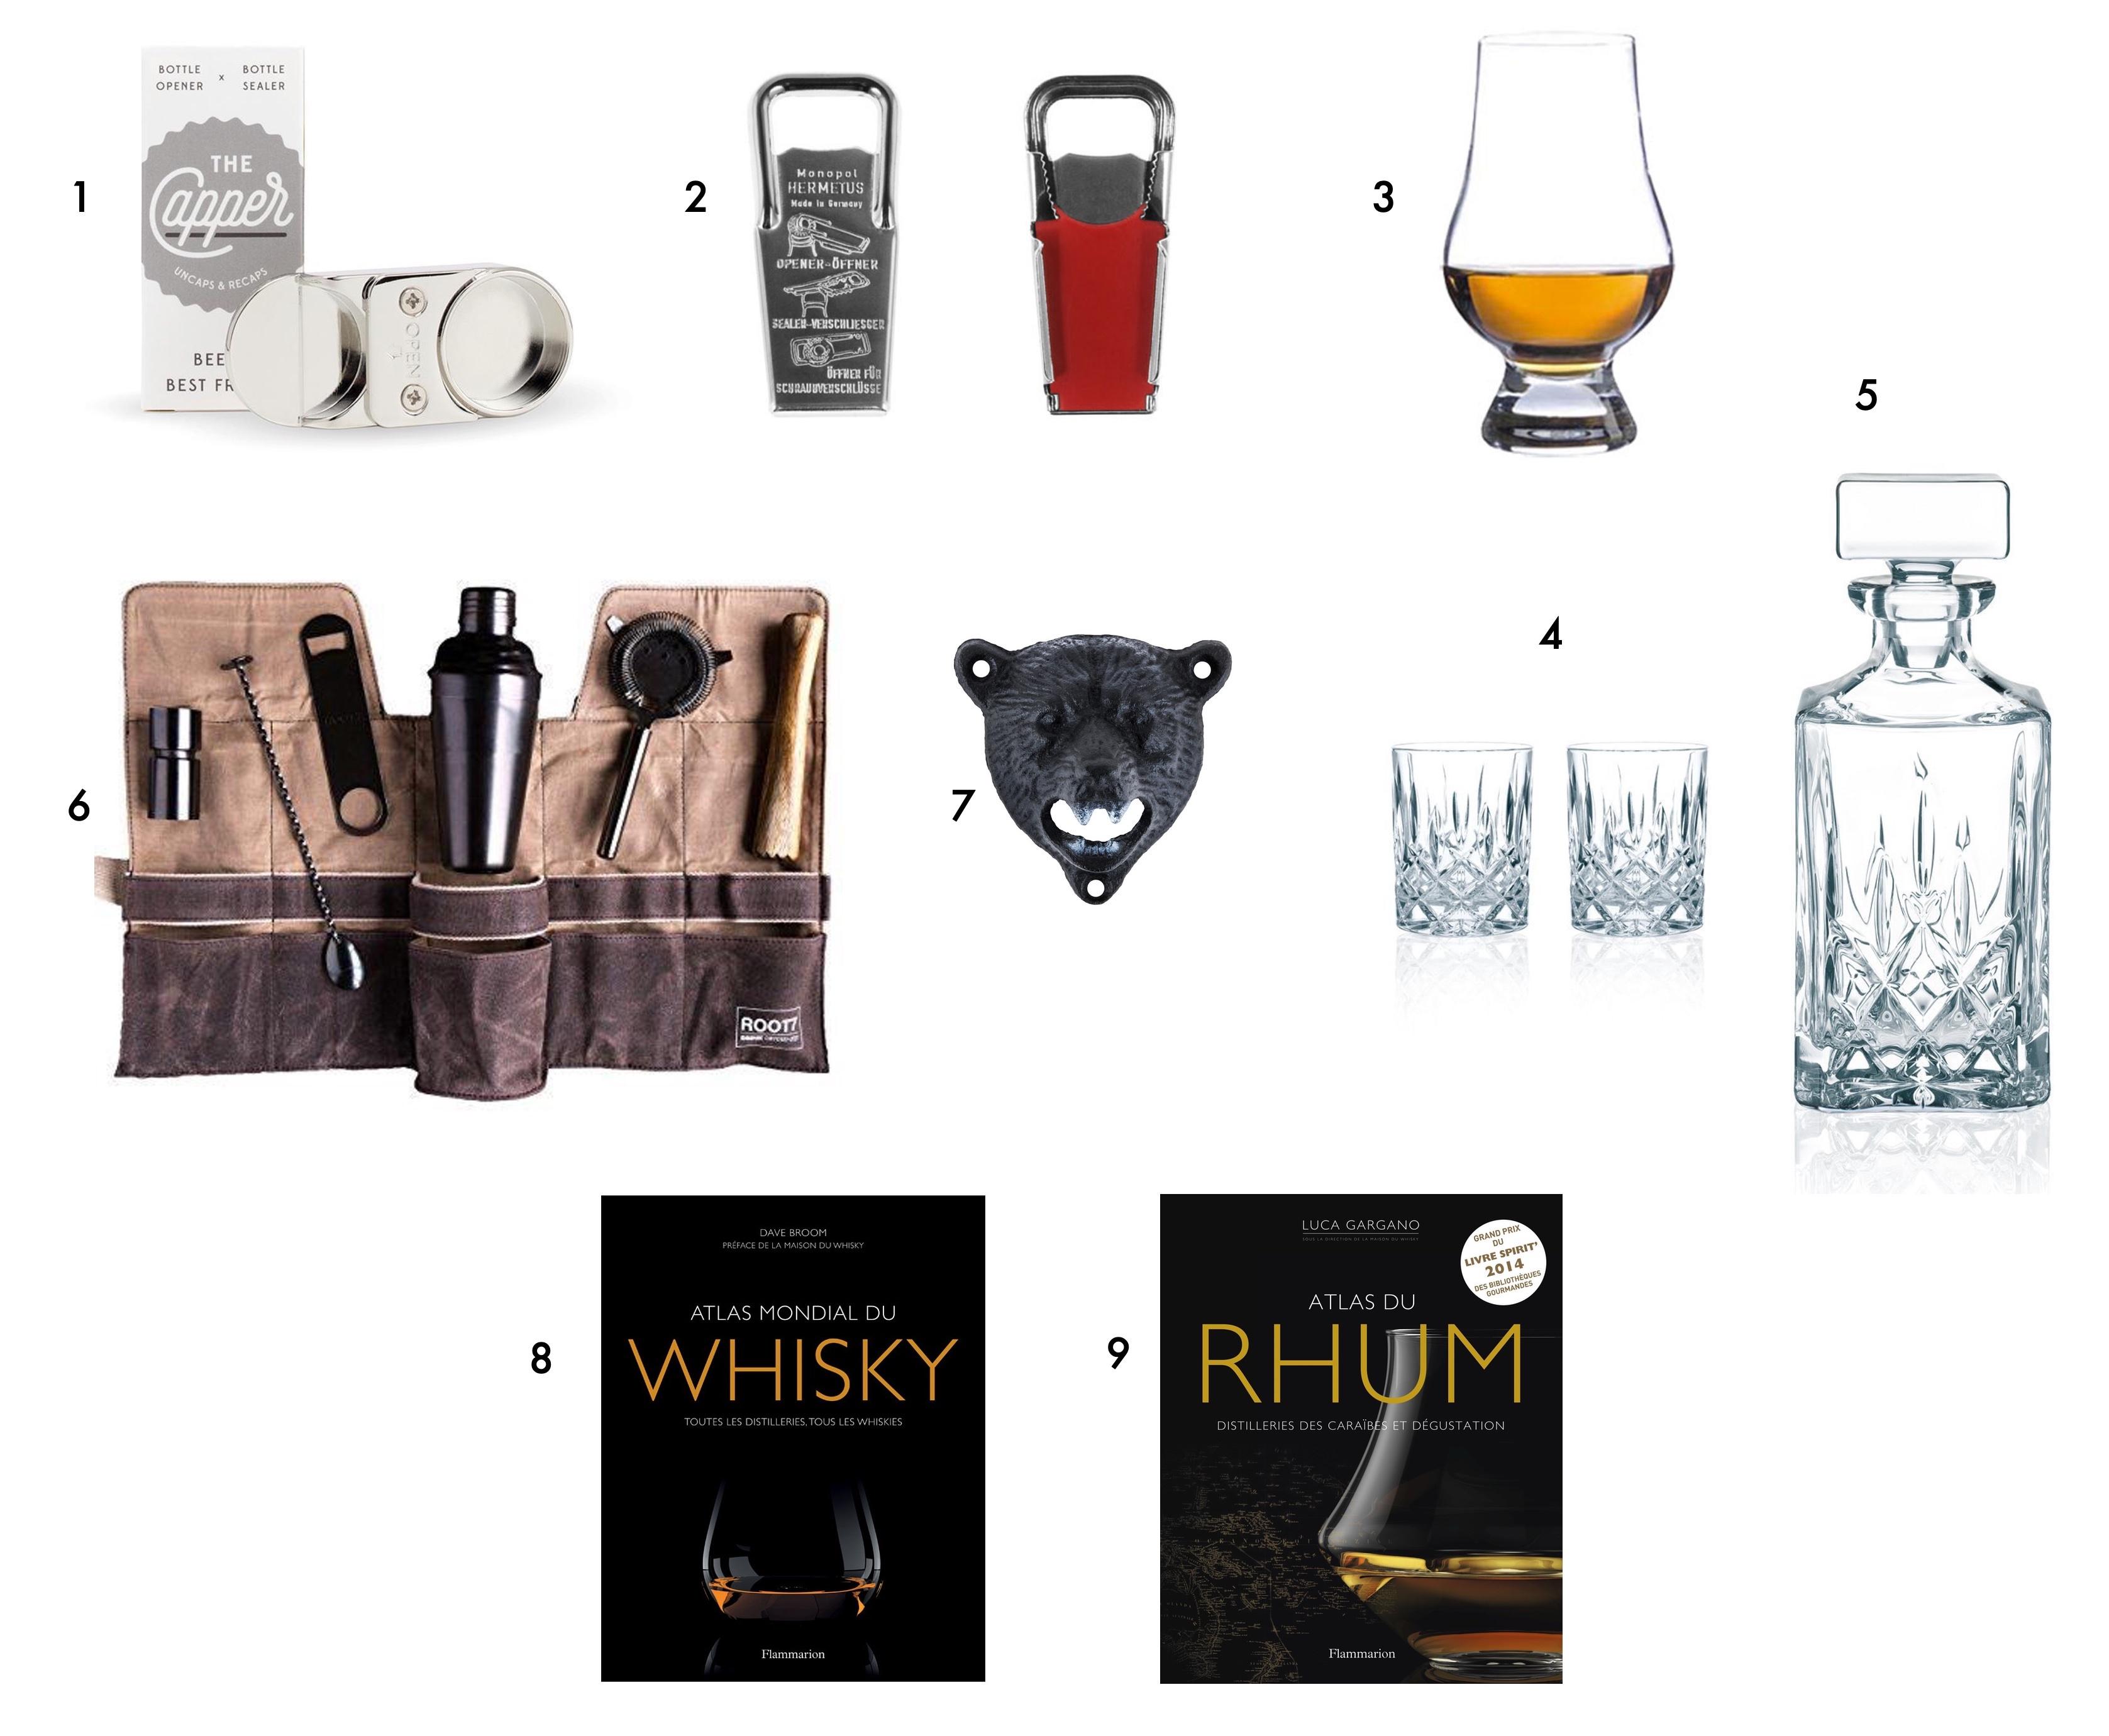 cadeau noel homme aime spiritueux vin whisky